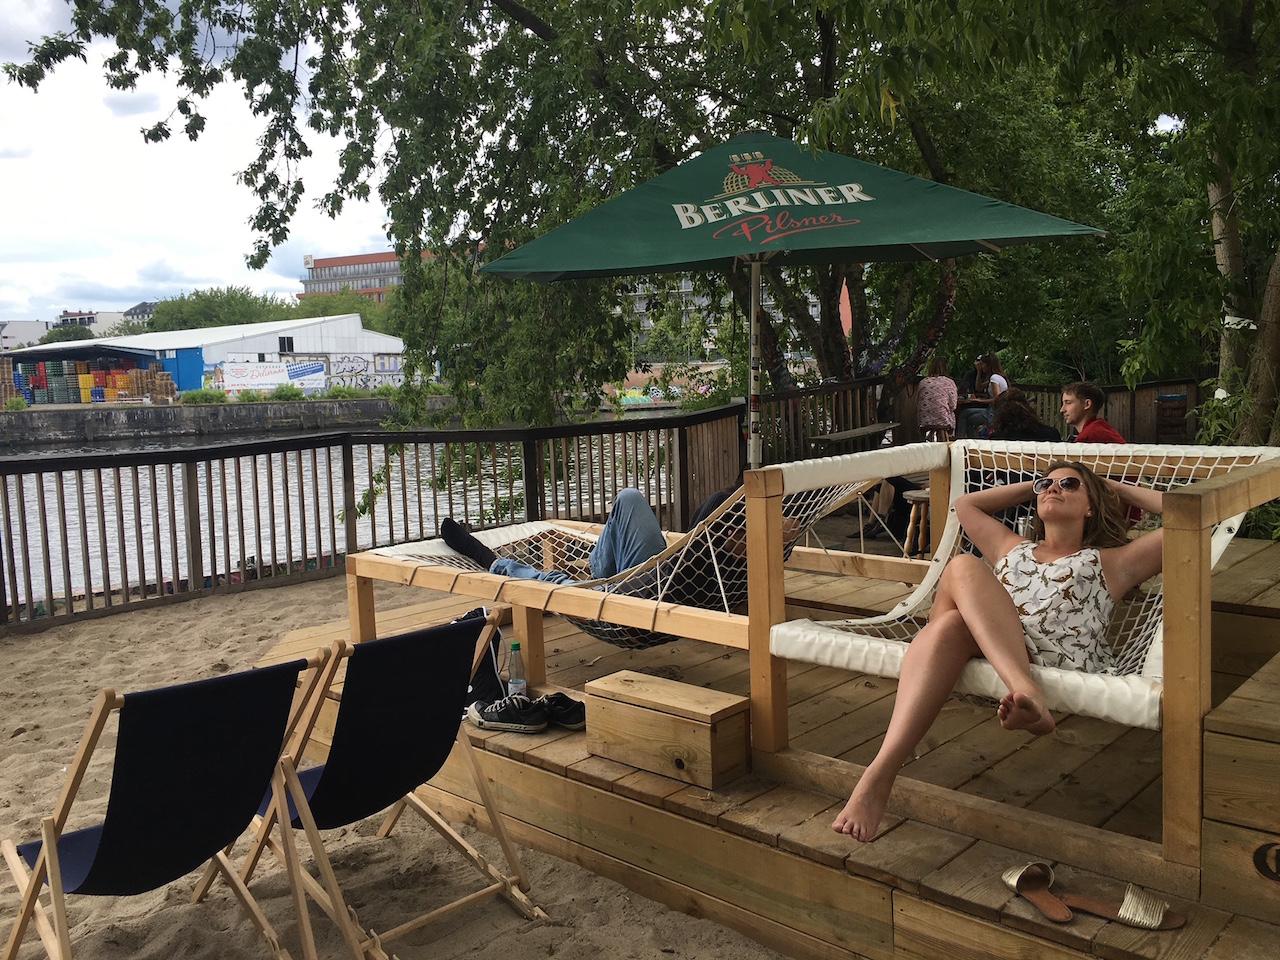 Relax na praia em Berlim - Yaam